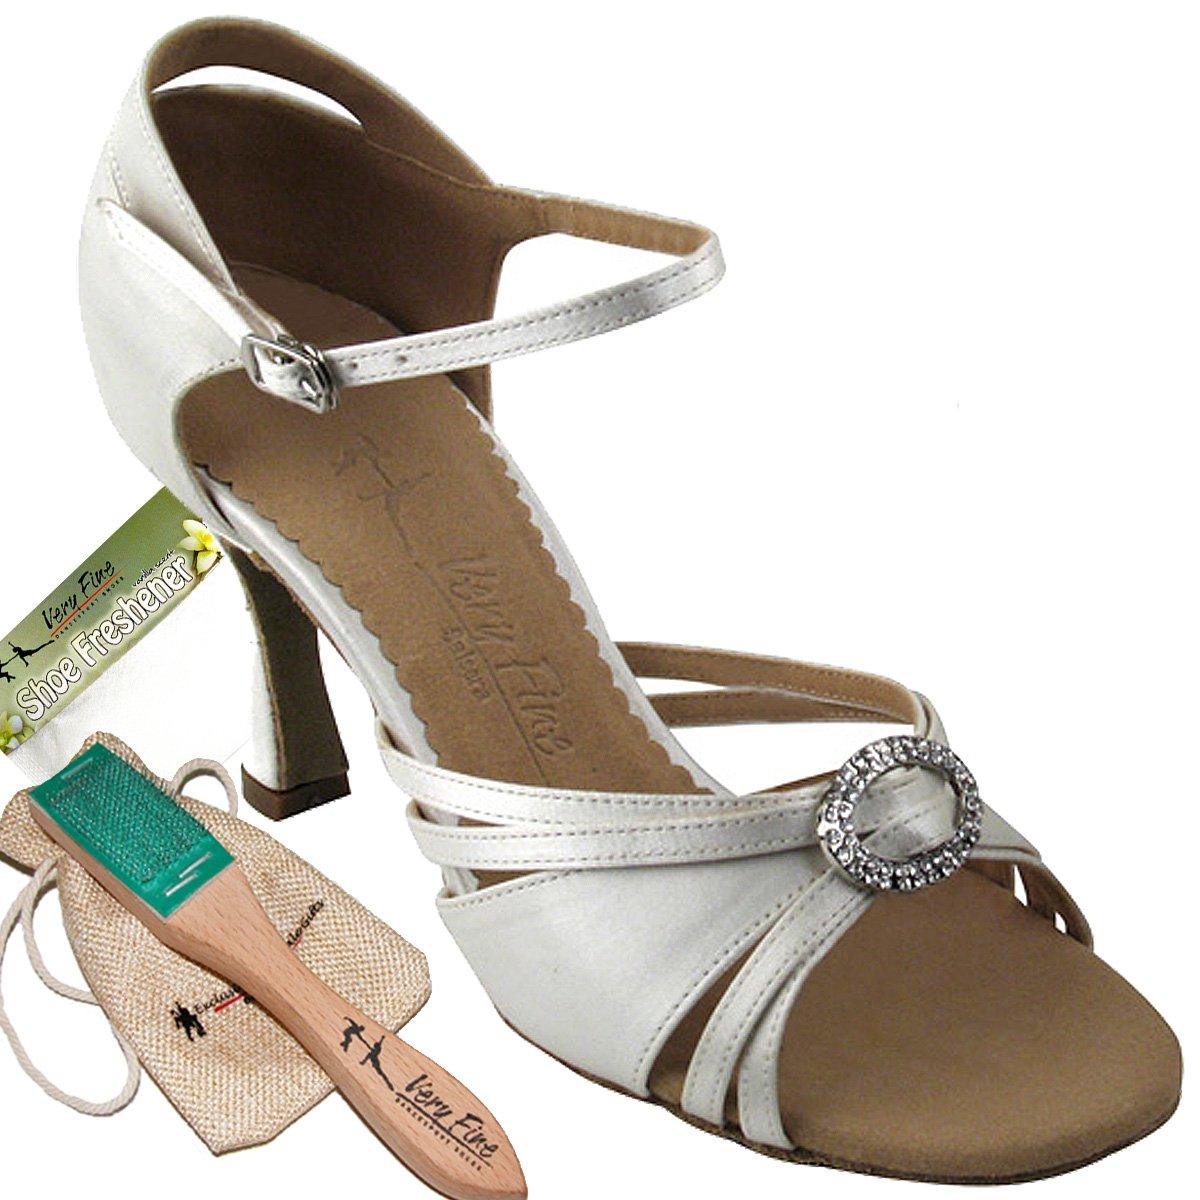 Women's Ballroom Dance Shoes Tango Wedding Salsa Dance Shoes Ivory Sera1154EB Comfortable - Very Fine 2.5'' Heel 6.5 M US [Bundle of 5]